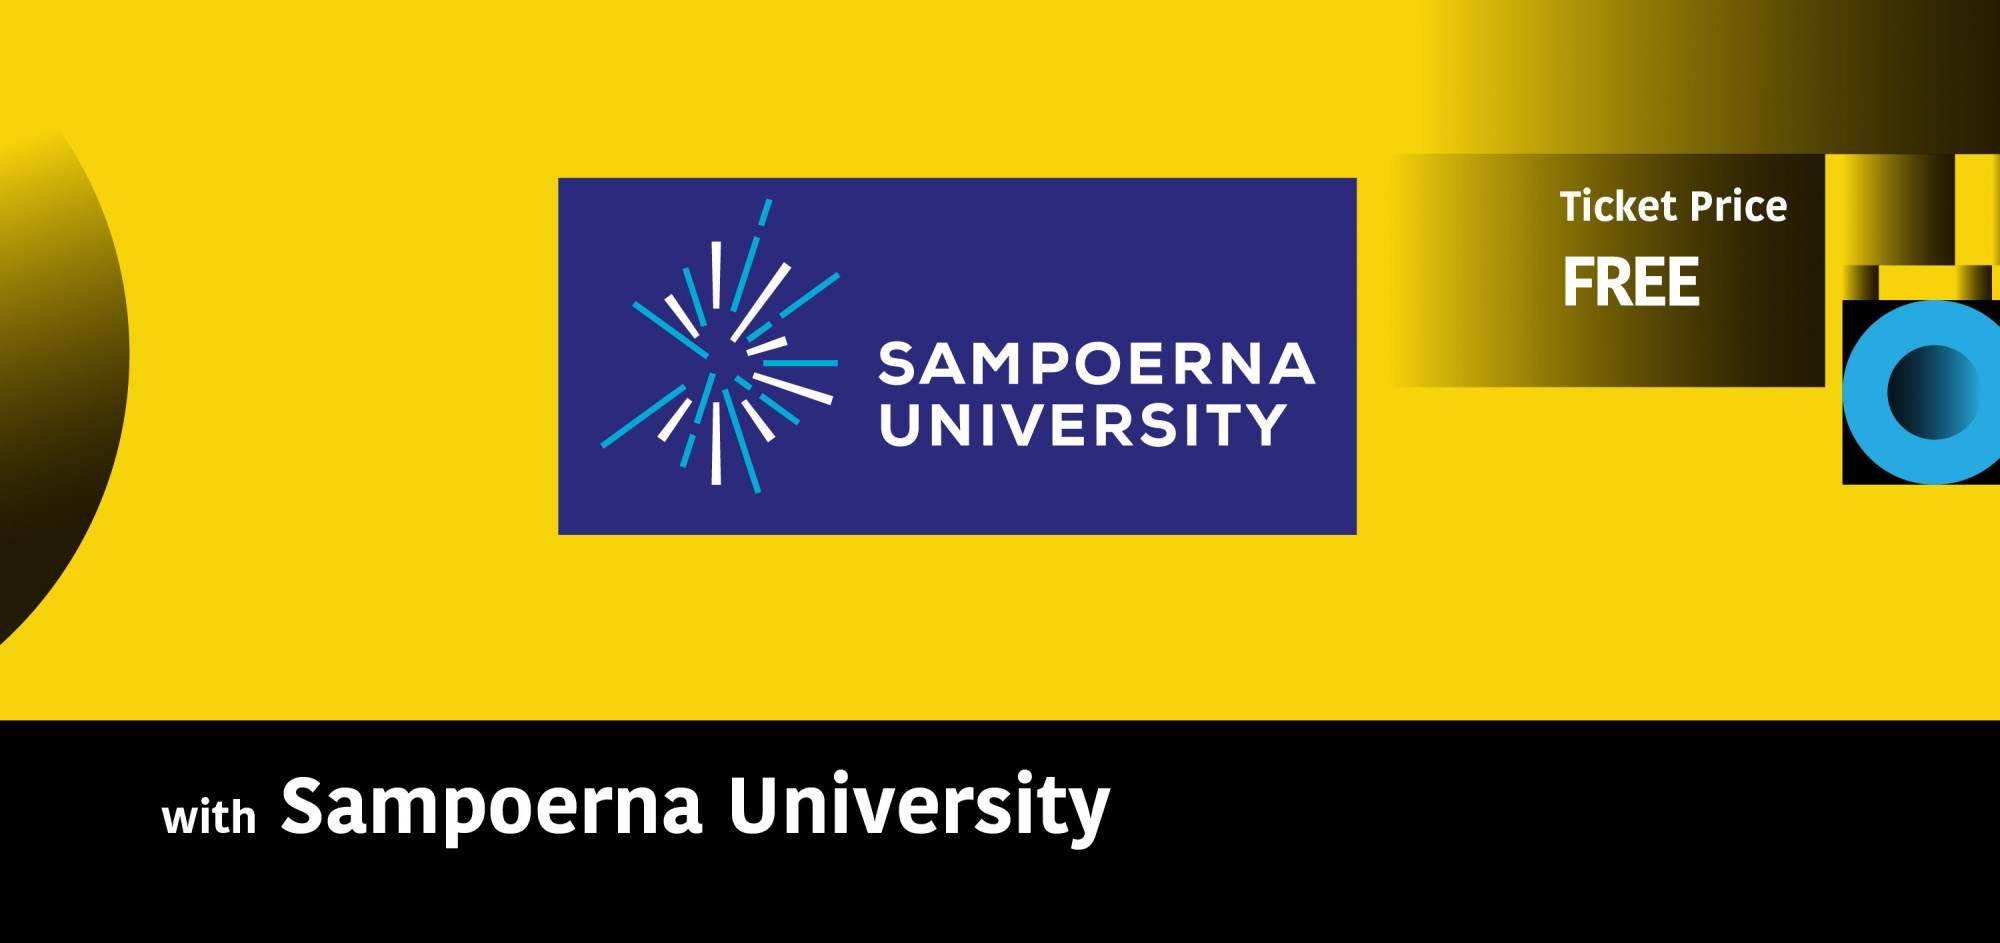 [The Classroom] Sampoerna University : The Future Challenge of Design, Technology and media